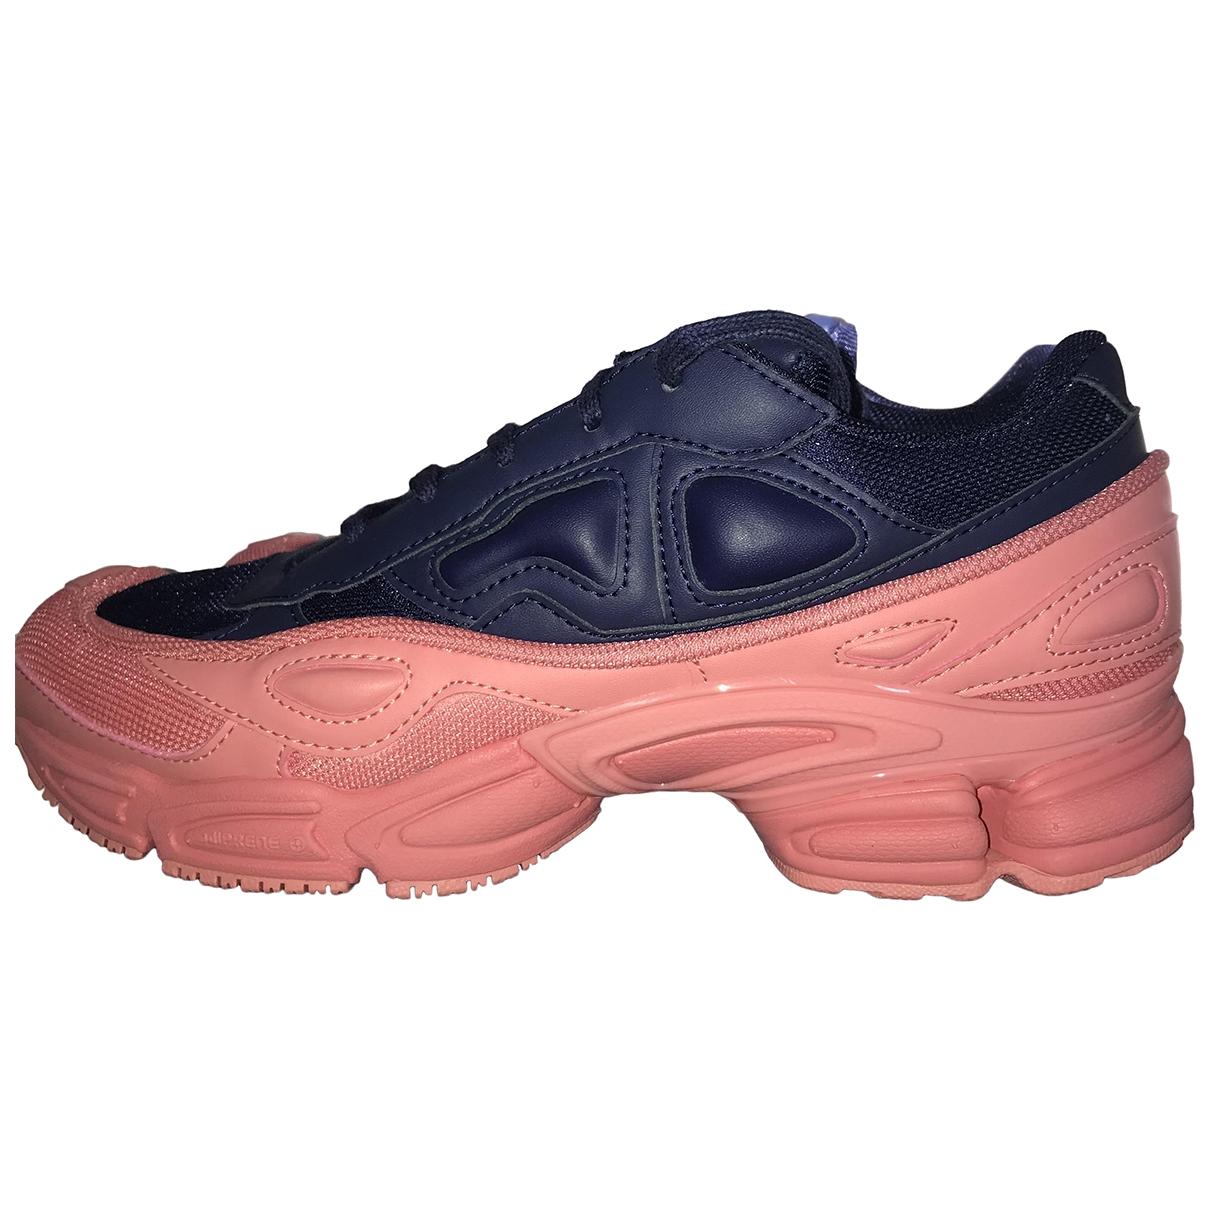 Adidas X Raf Simons Ozweego 2 Pink Cloth Trainers for Women 40 EU